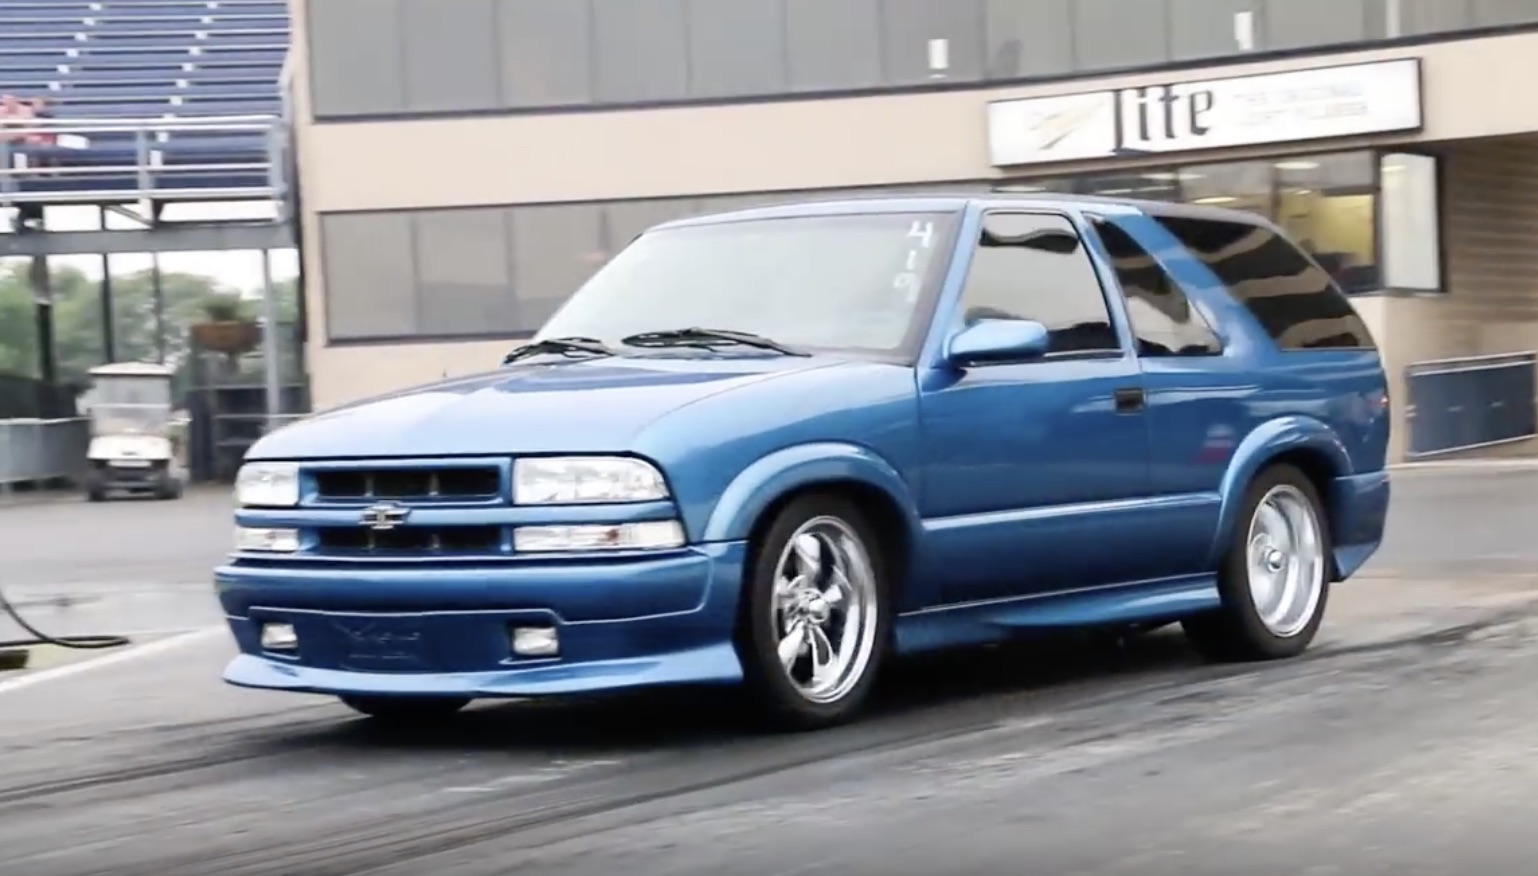 Bangshift Com Xtreme Opposite This Is How A 2000s Era Chevrolet Blazer Should Act Bangshift Com